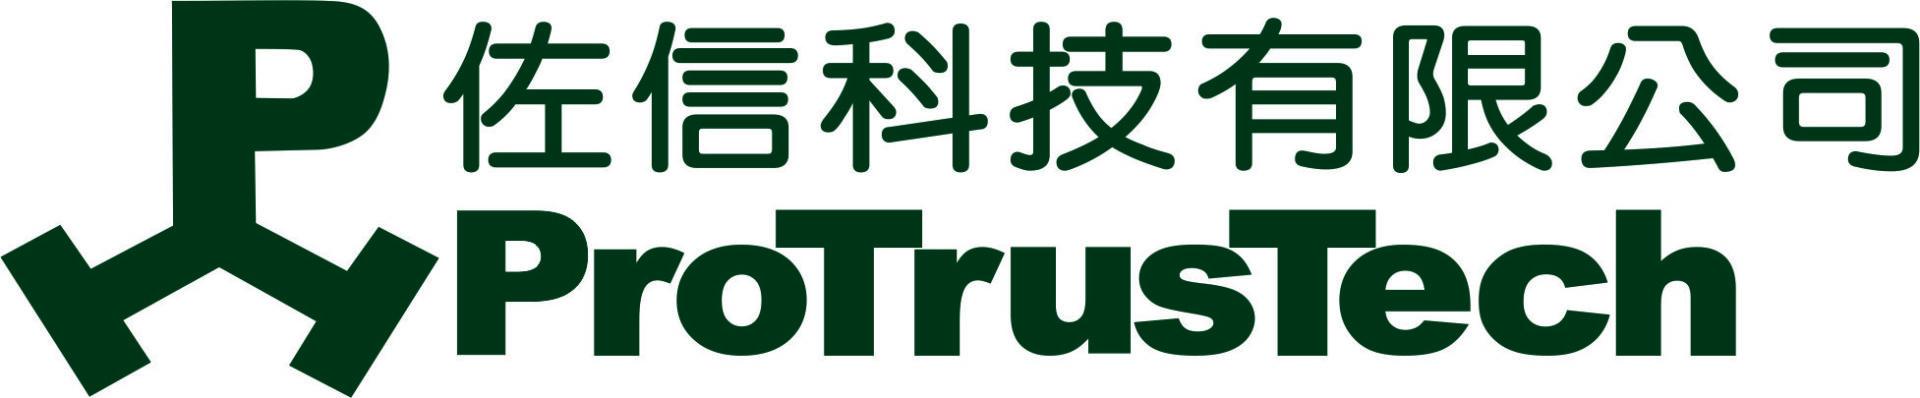 Protrustech Co., Ltd